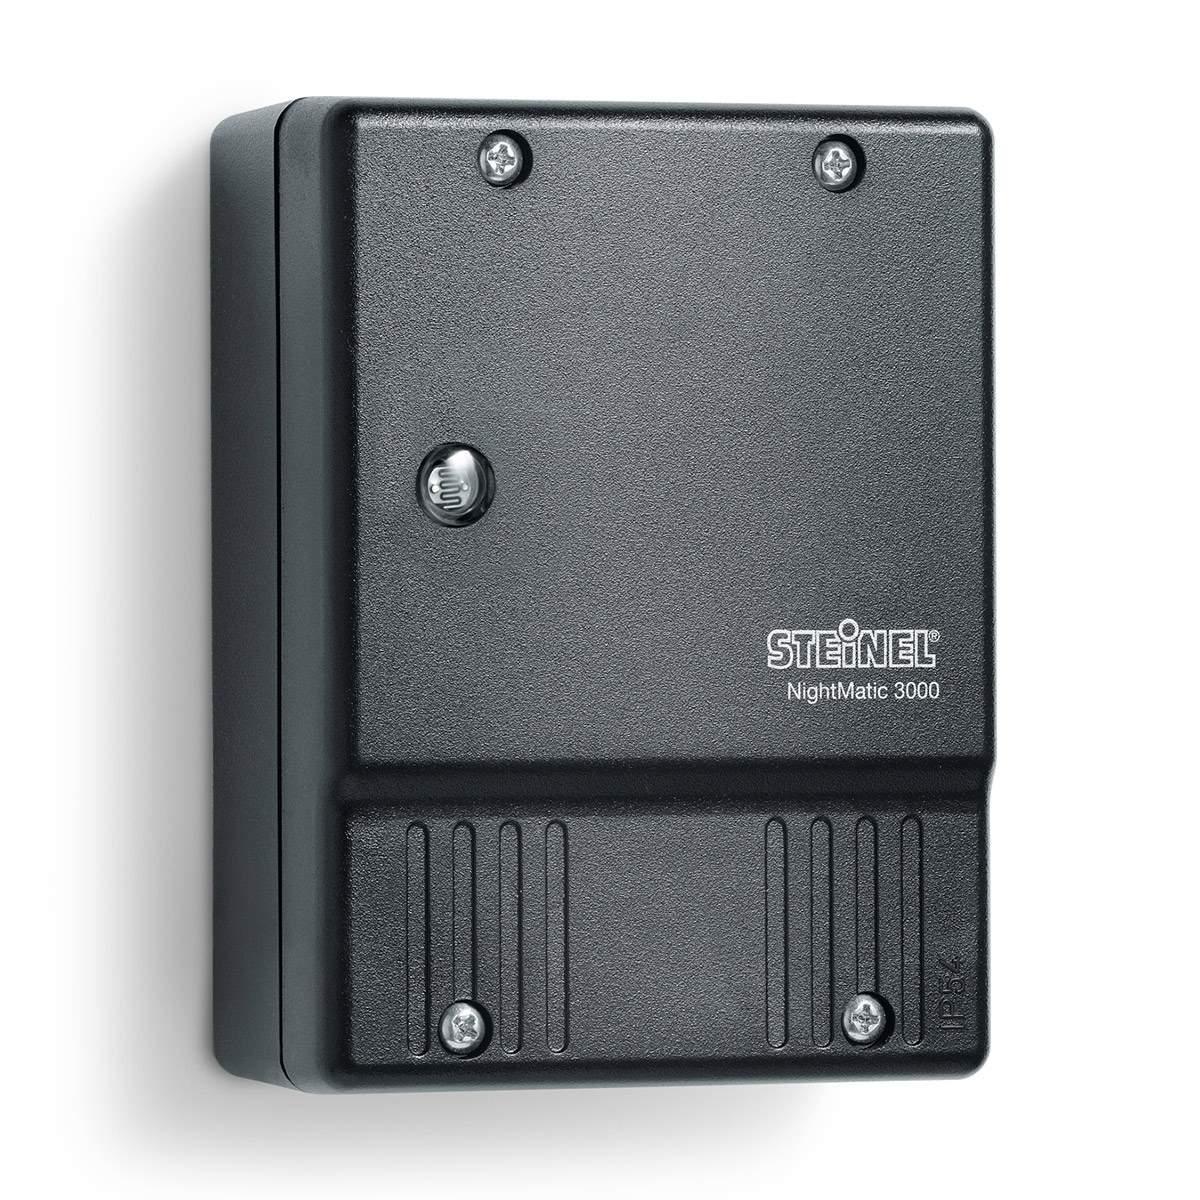 Interruttore crepuscolare Nightmatic 3000 Illuminazione per interni